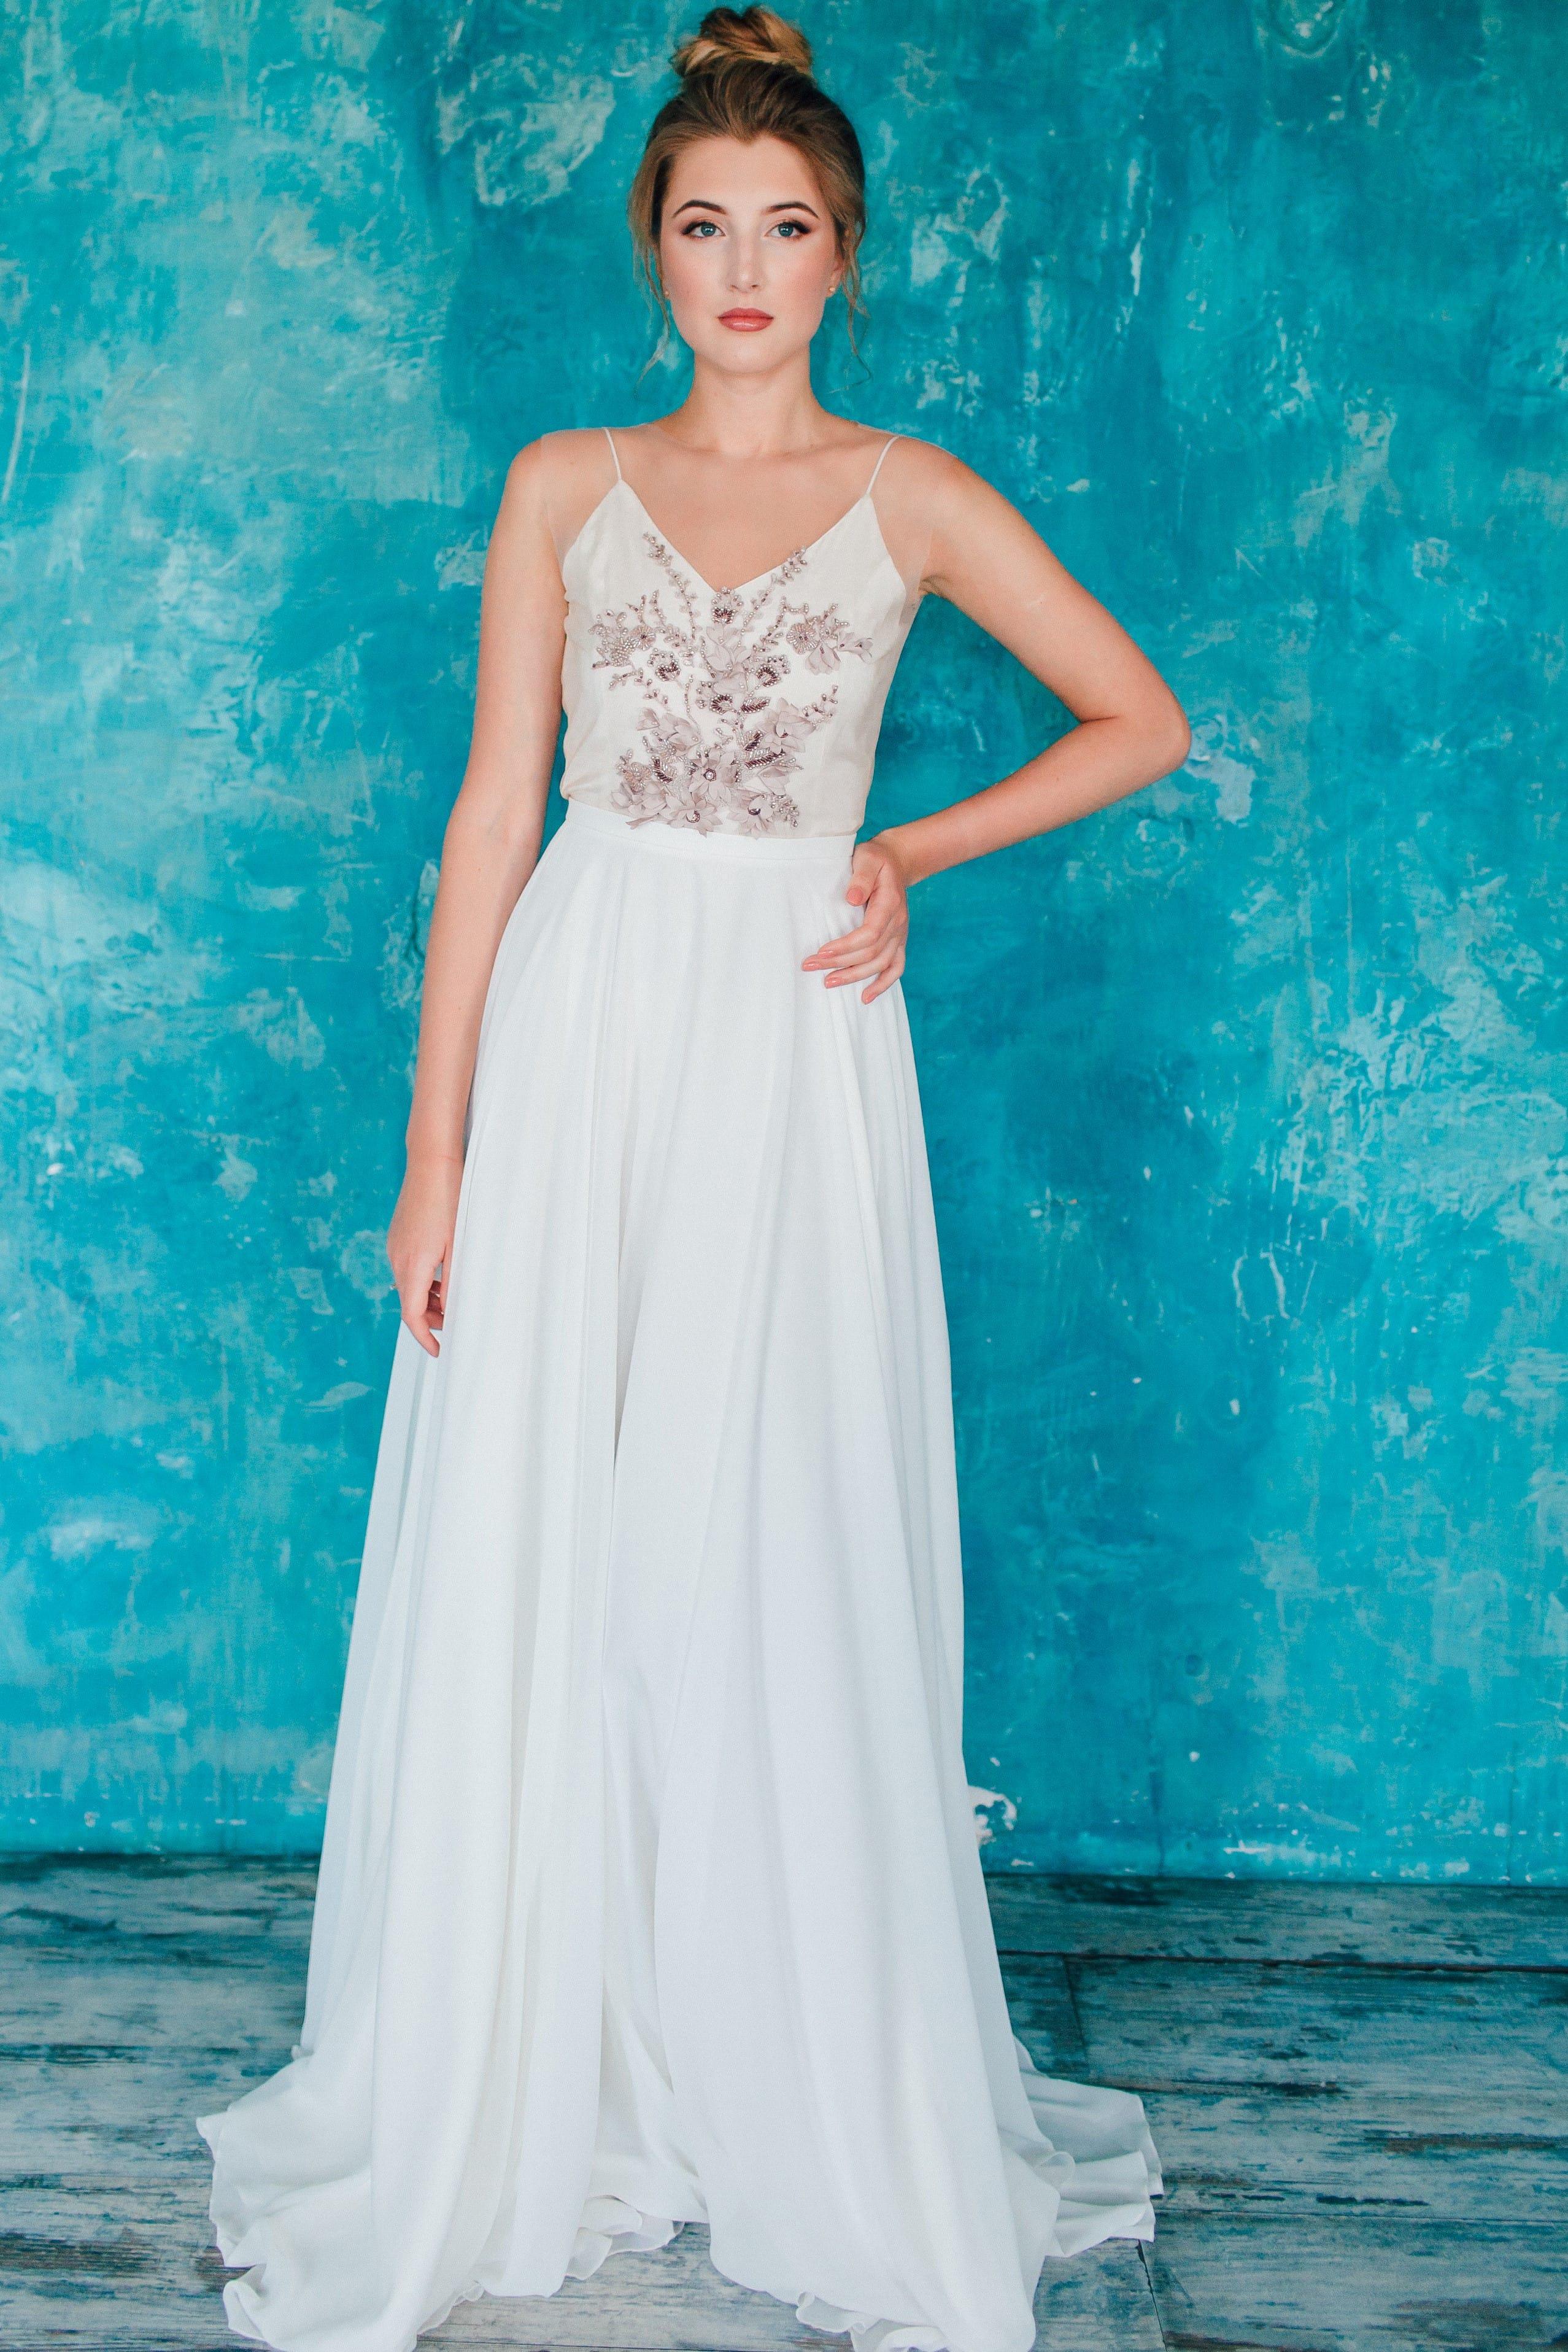 Свадебное платье LAYLA, коллекция THE ANGELS, бренд RARE BRIDAL, фото 1